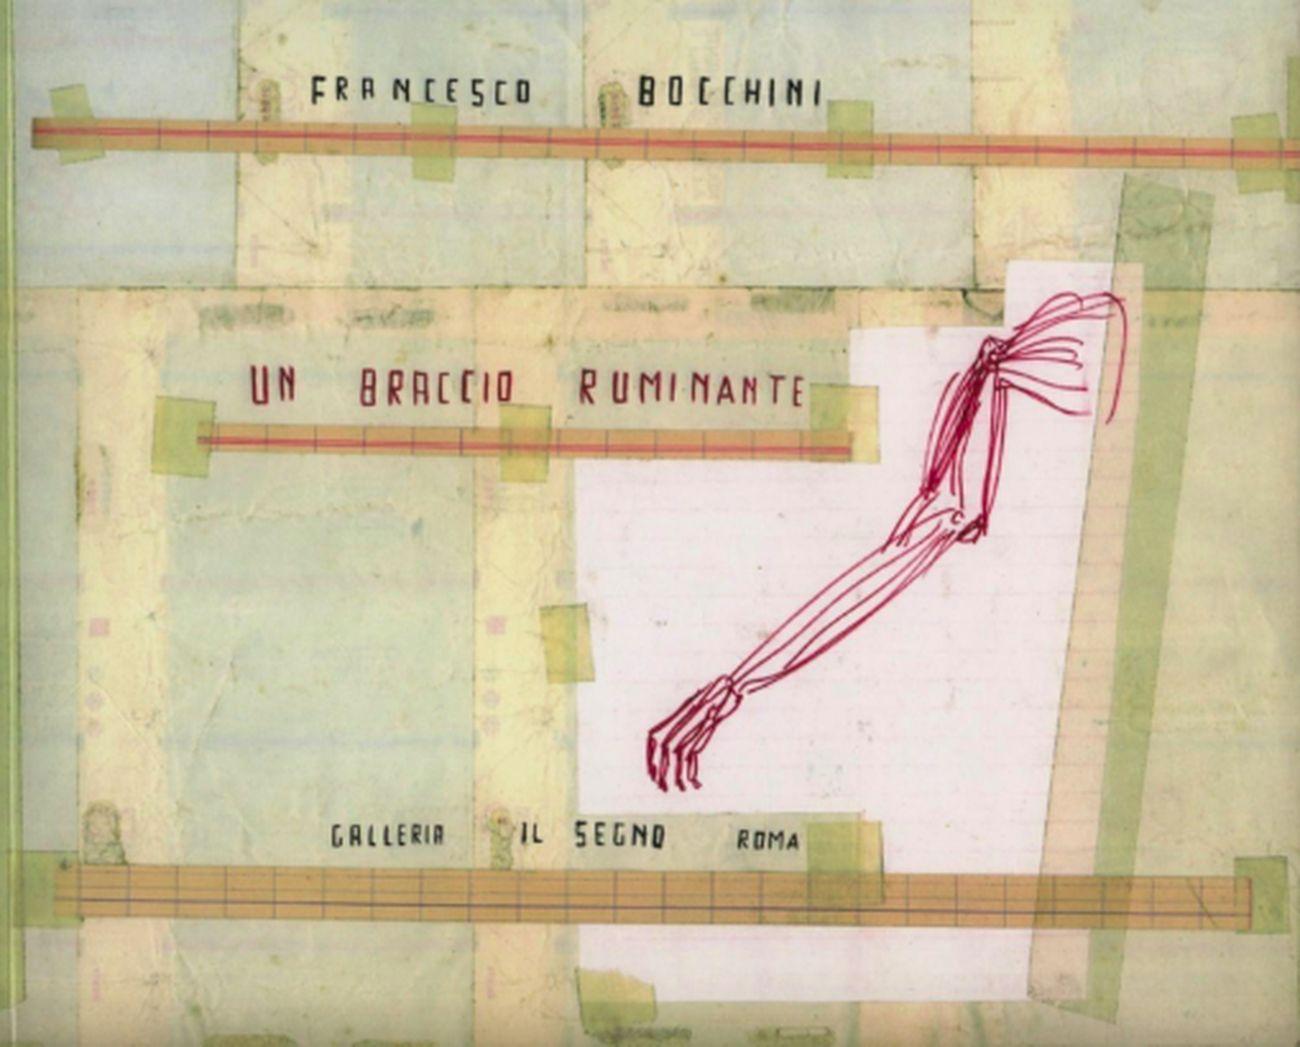 Francesco Bocchini